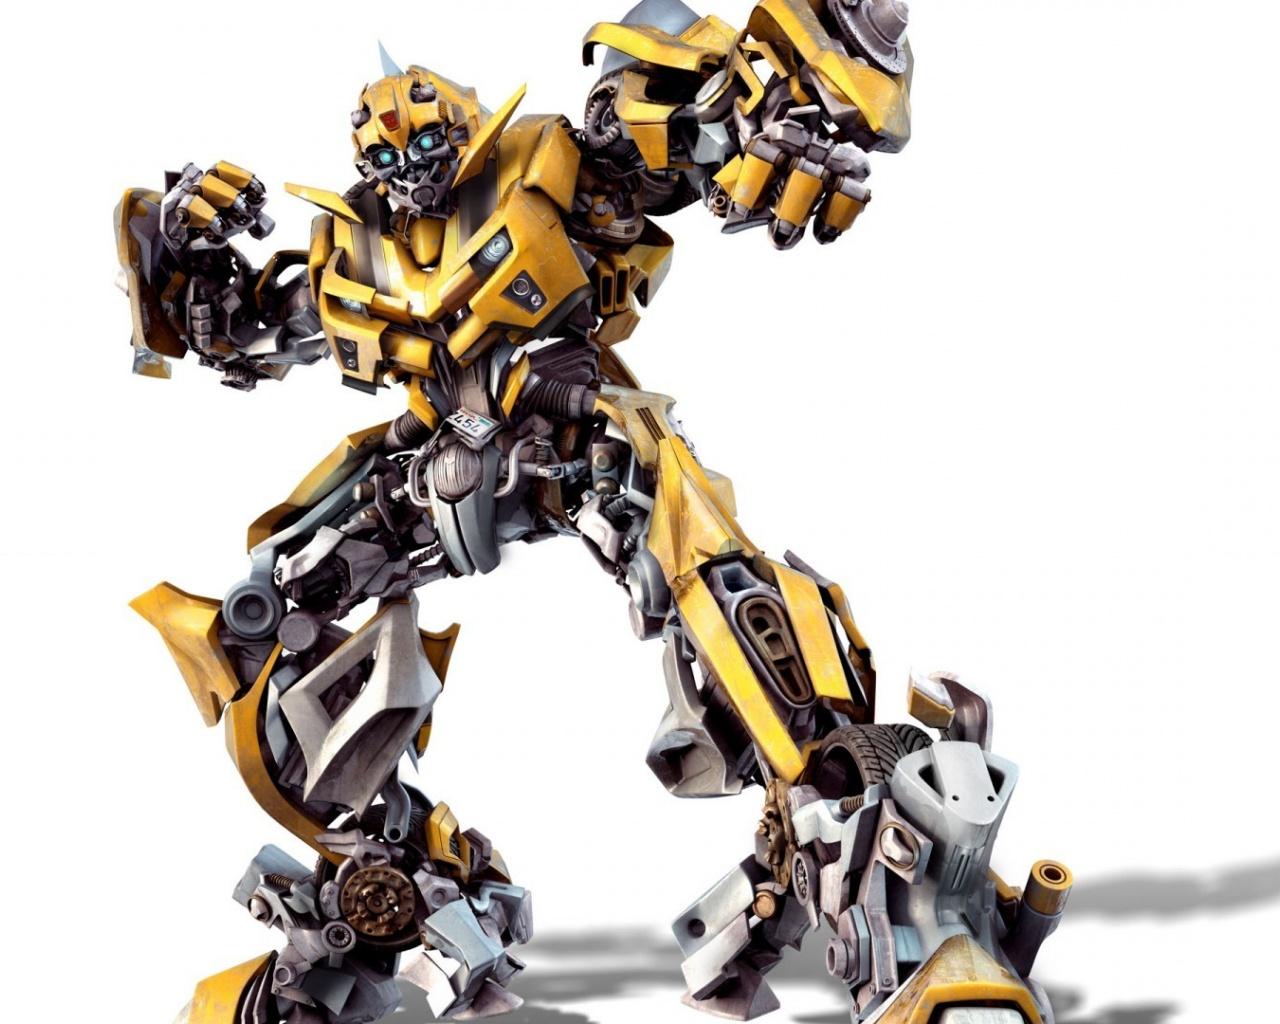 Transformers Bumblebee 1280x1024